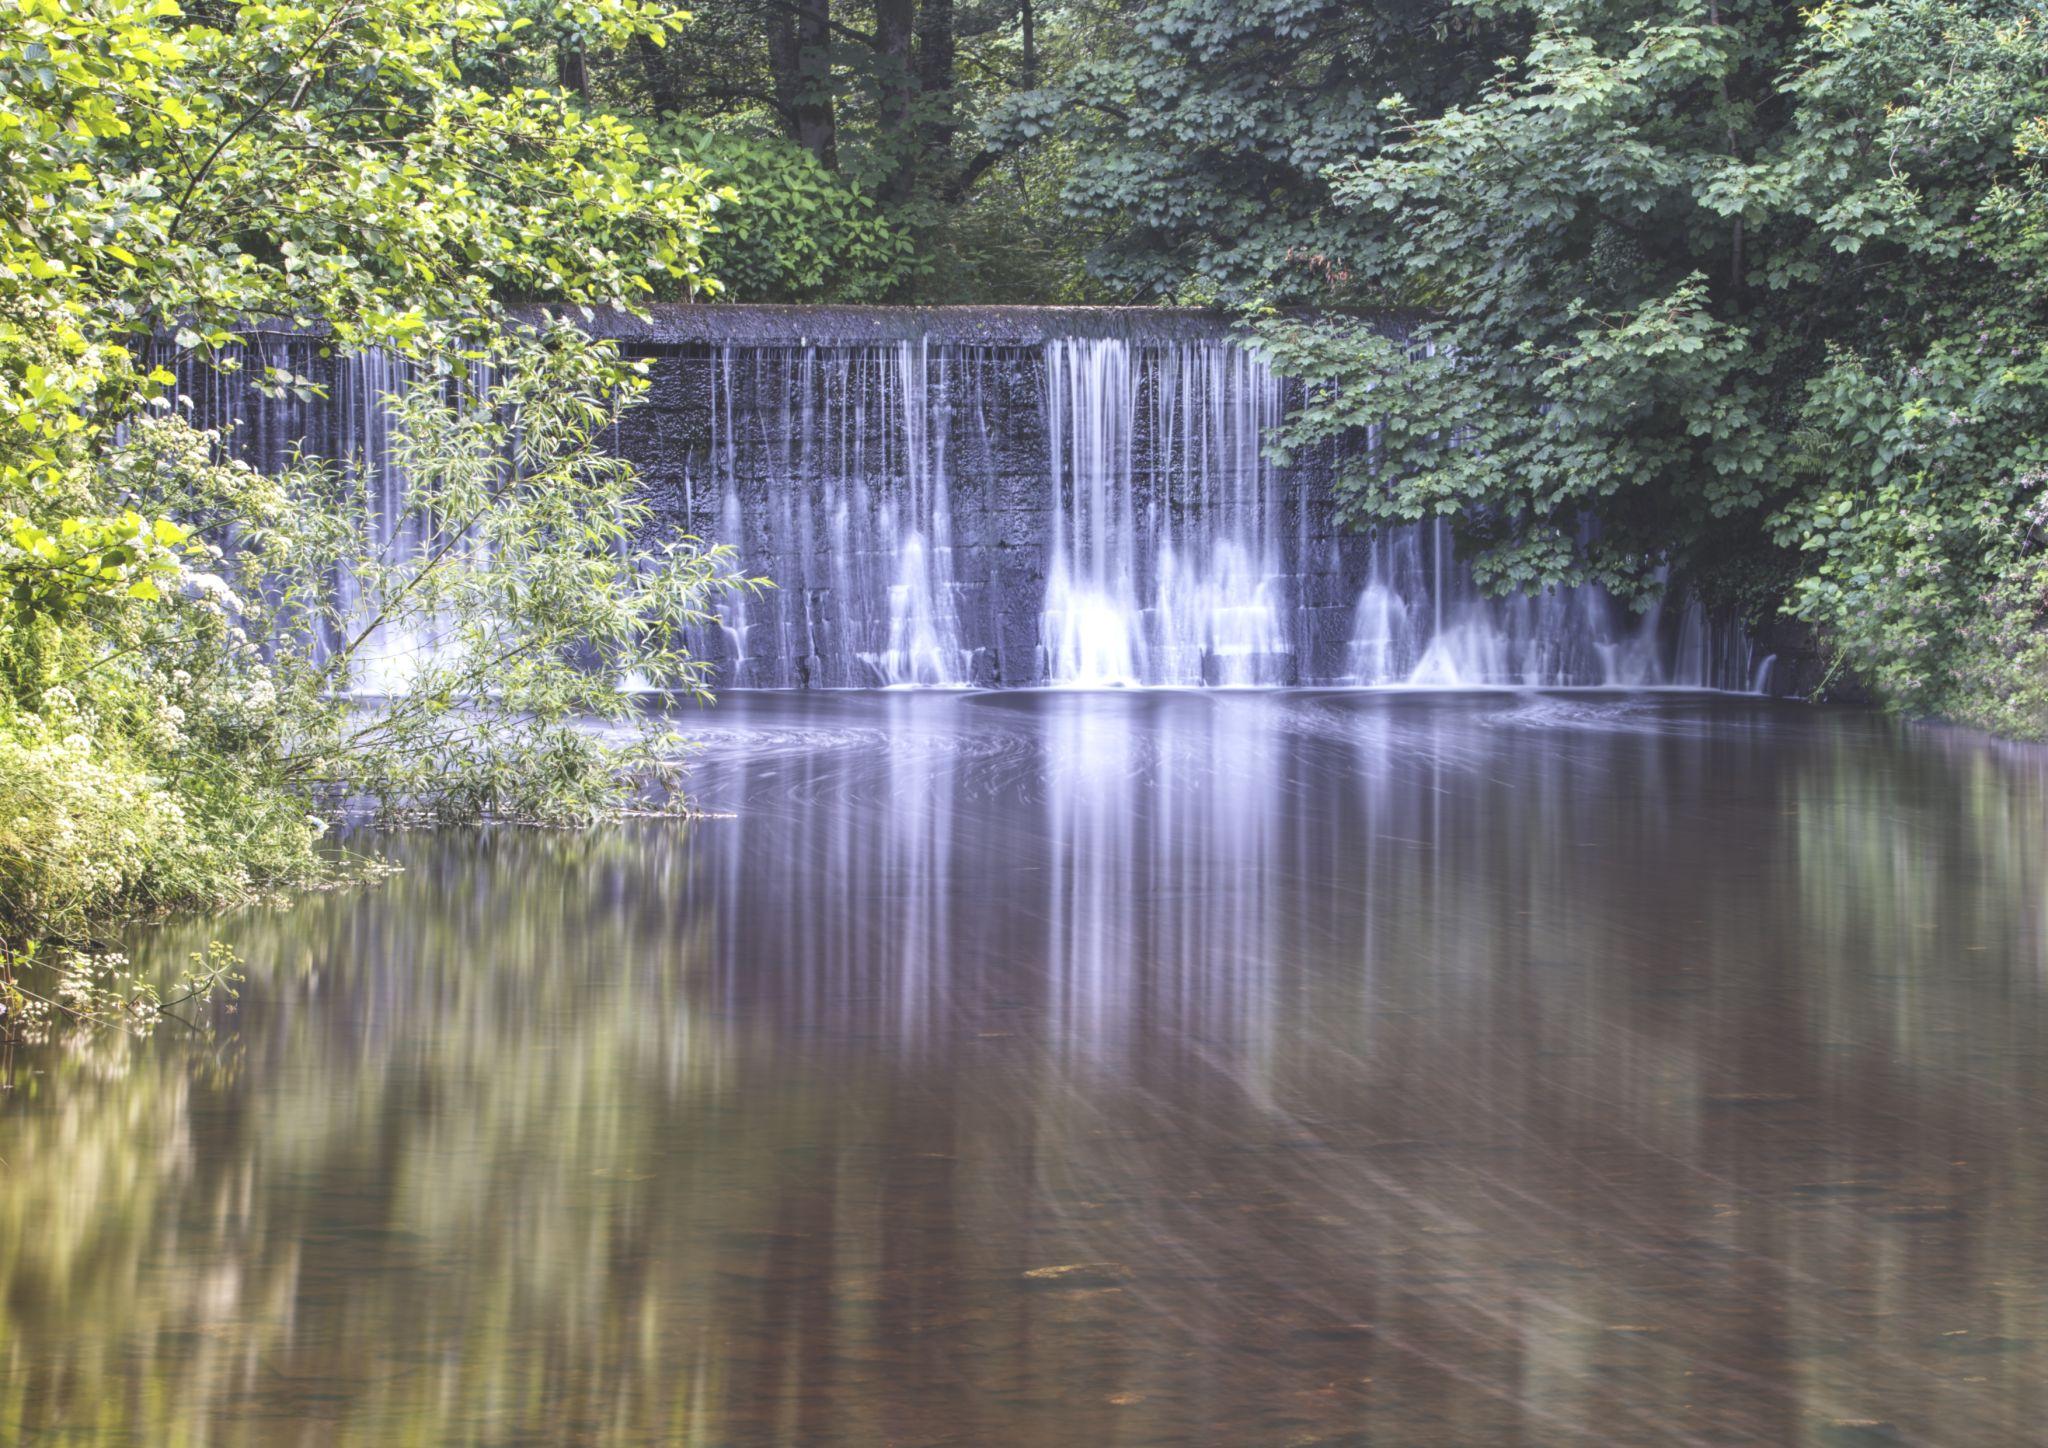 Duxbury Weir, United Kingdom